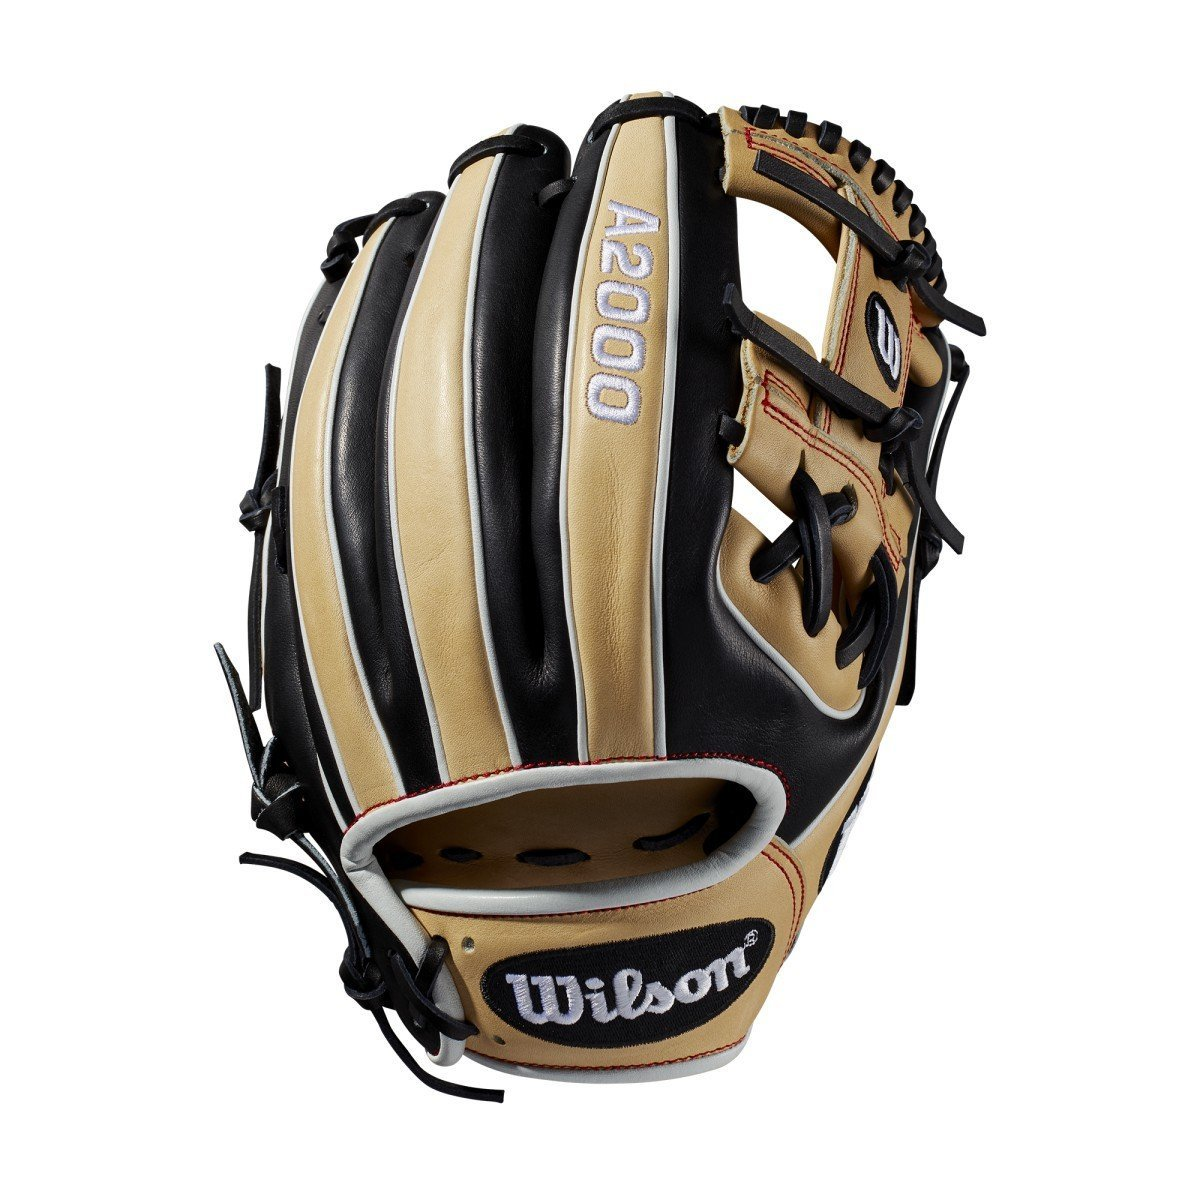 wilson baseball glove wta20rb19lejun